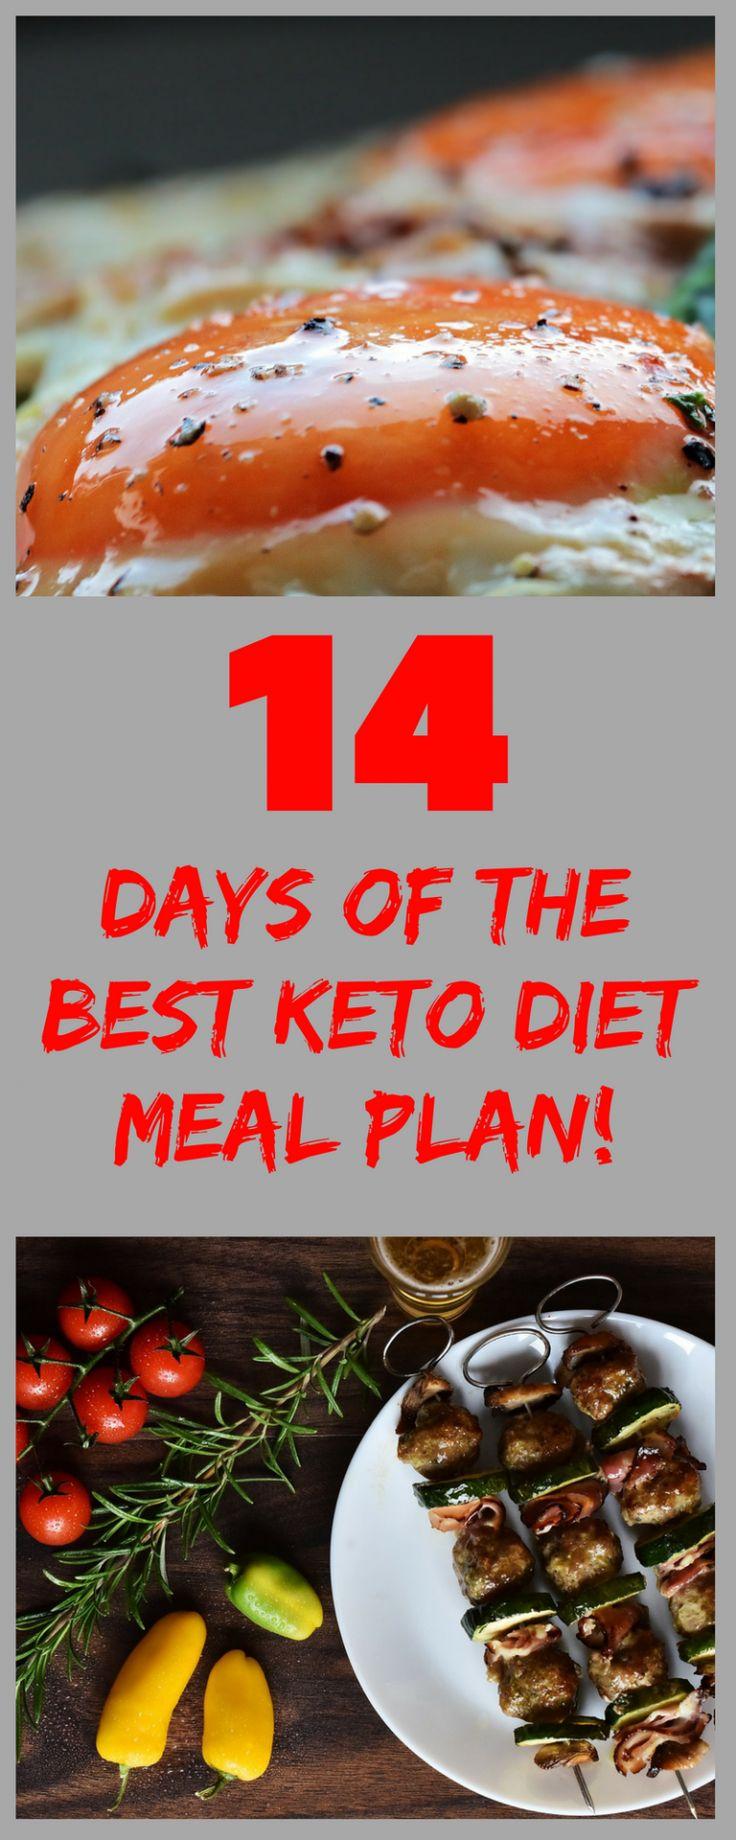 14 Days of the Best Keto Diet Meal Plan @ www.ironimmunity.com